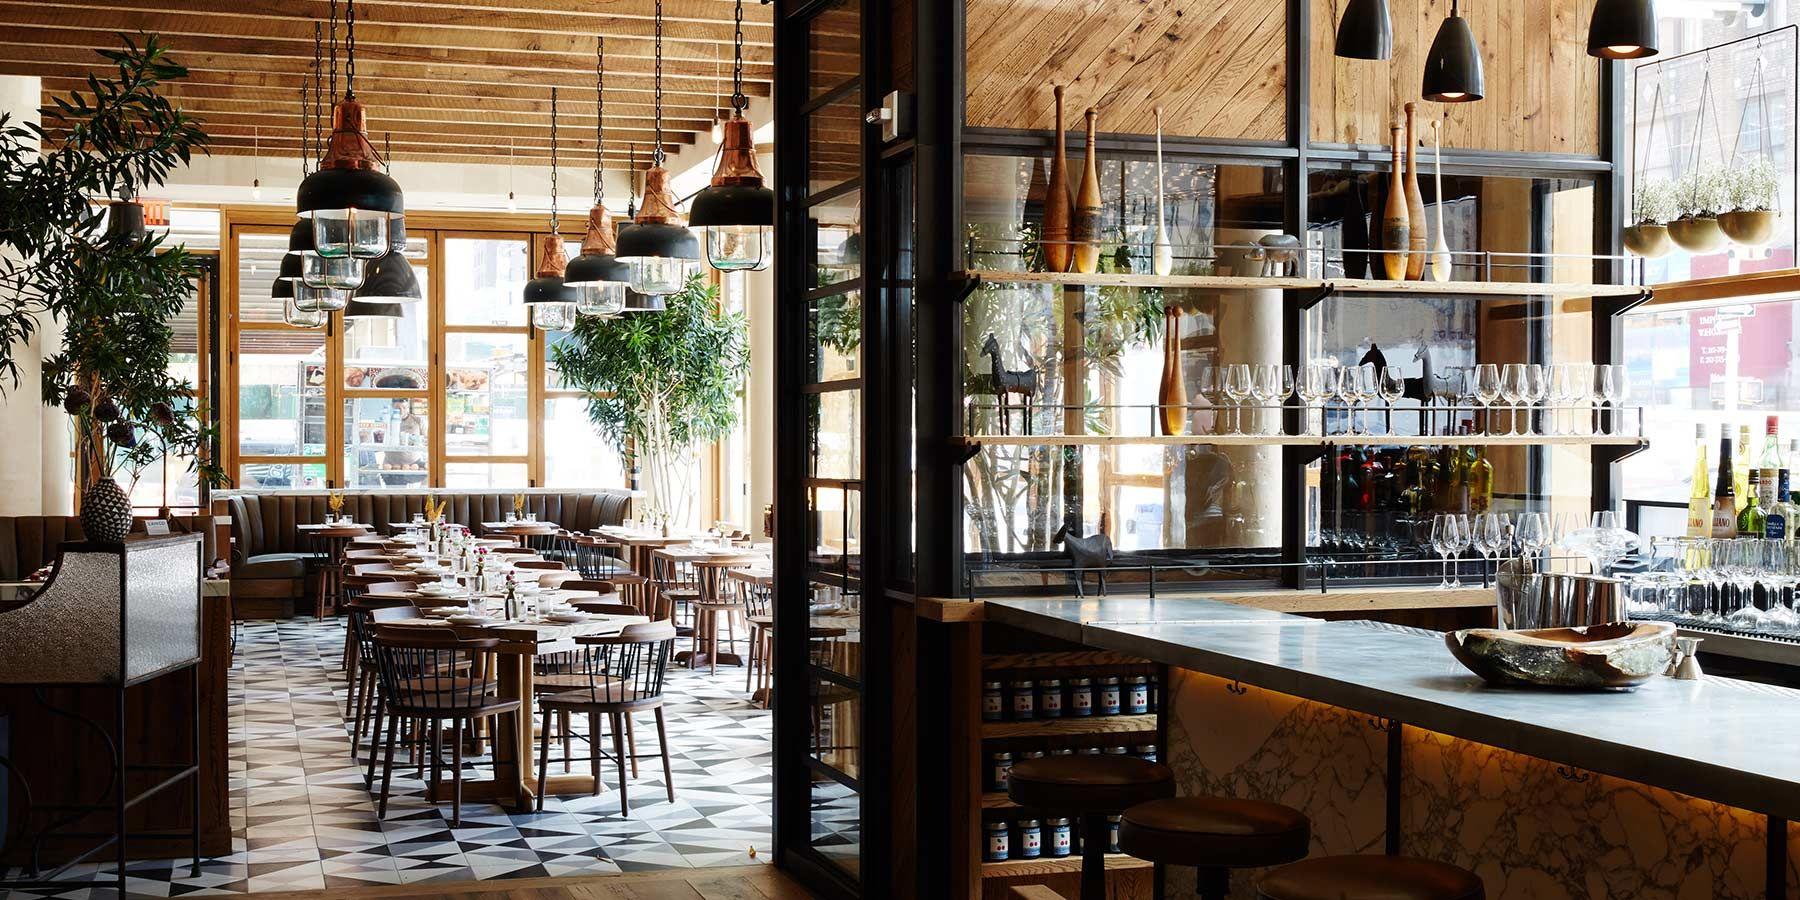 2015 Restaurant Bar Design Awards Entry LAmico New York United States The Americas